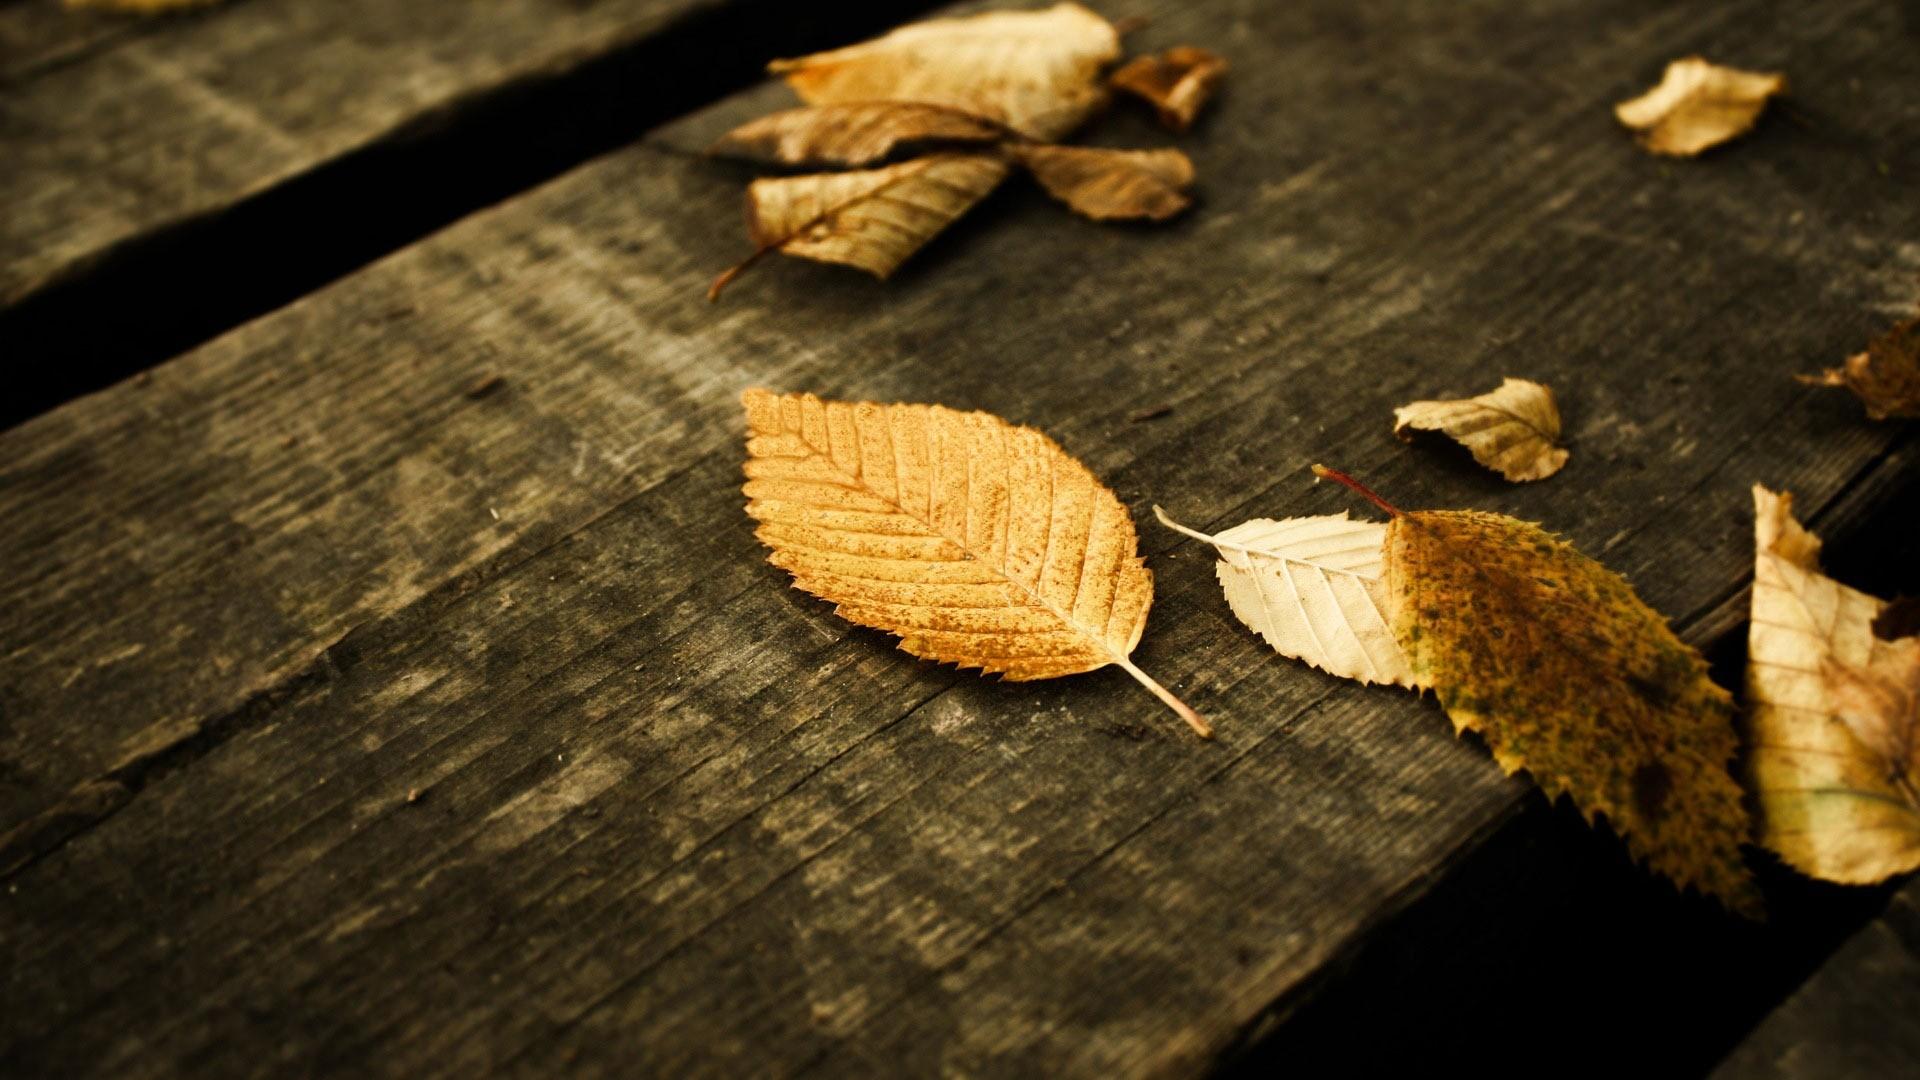 Sfondi Desktop gratis · Animali e Natura · Natura Autumn wallpapers –  fallen leaves